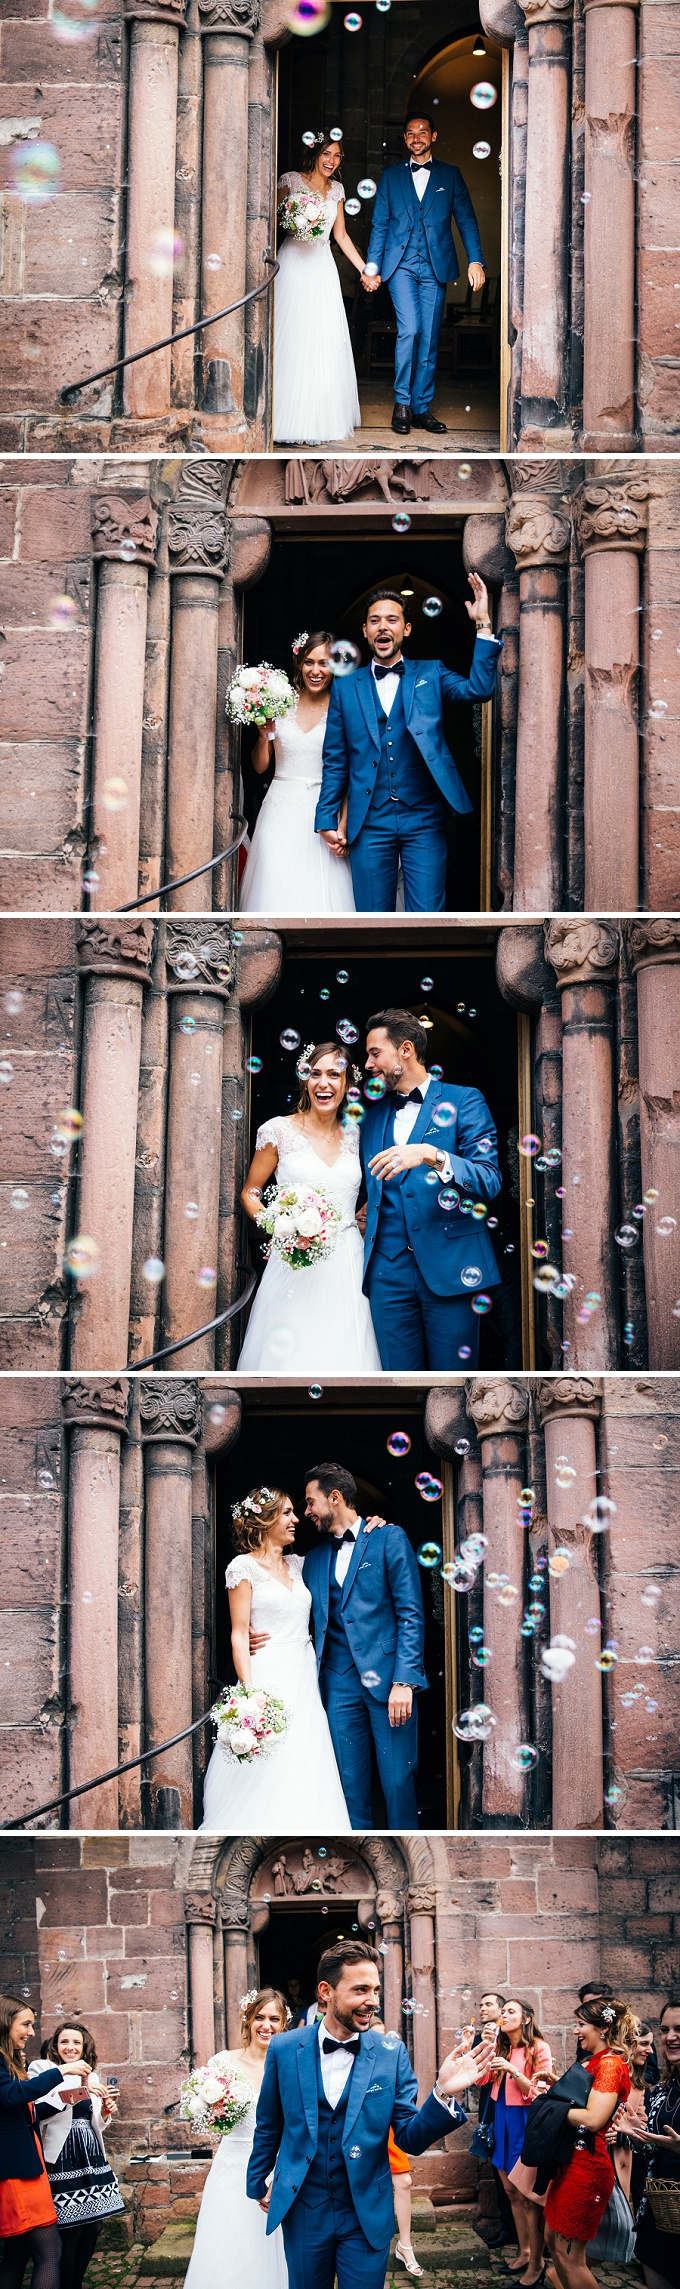 mariage-chateau-dosthoffen-016.jpg